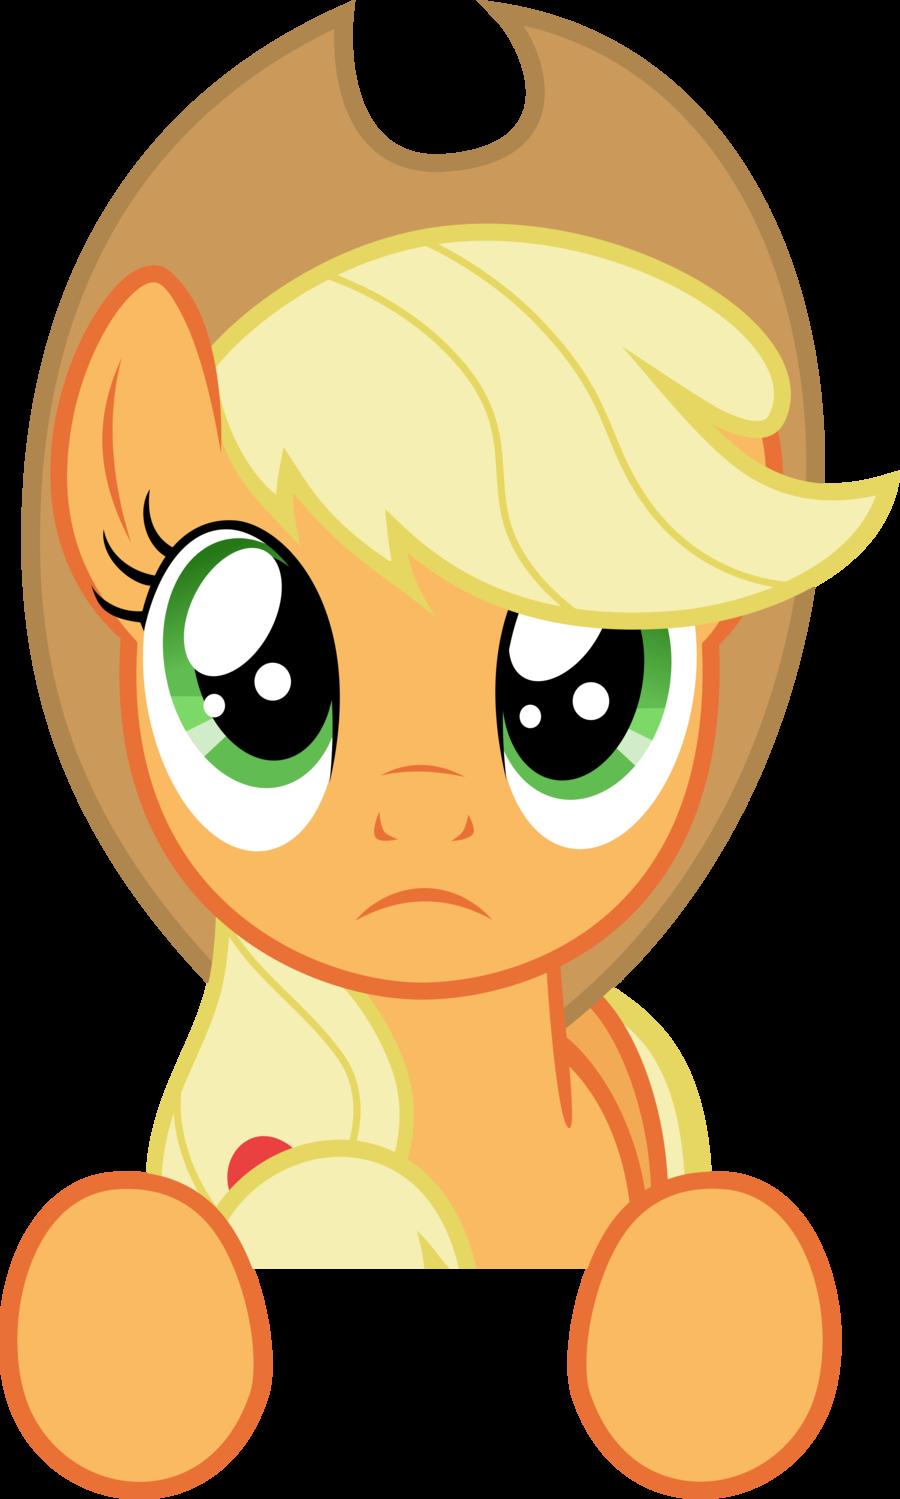 Apple jacks clipart png royalty free download DeviantArt: More Like My Little Pony vector - sad Applejack by ... png royalty free download